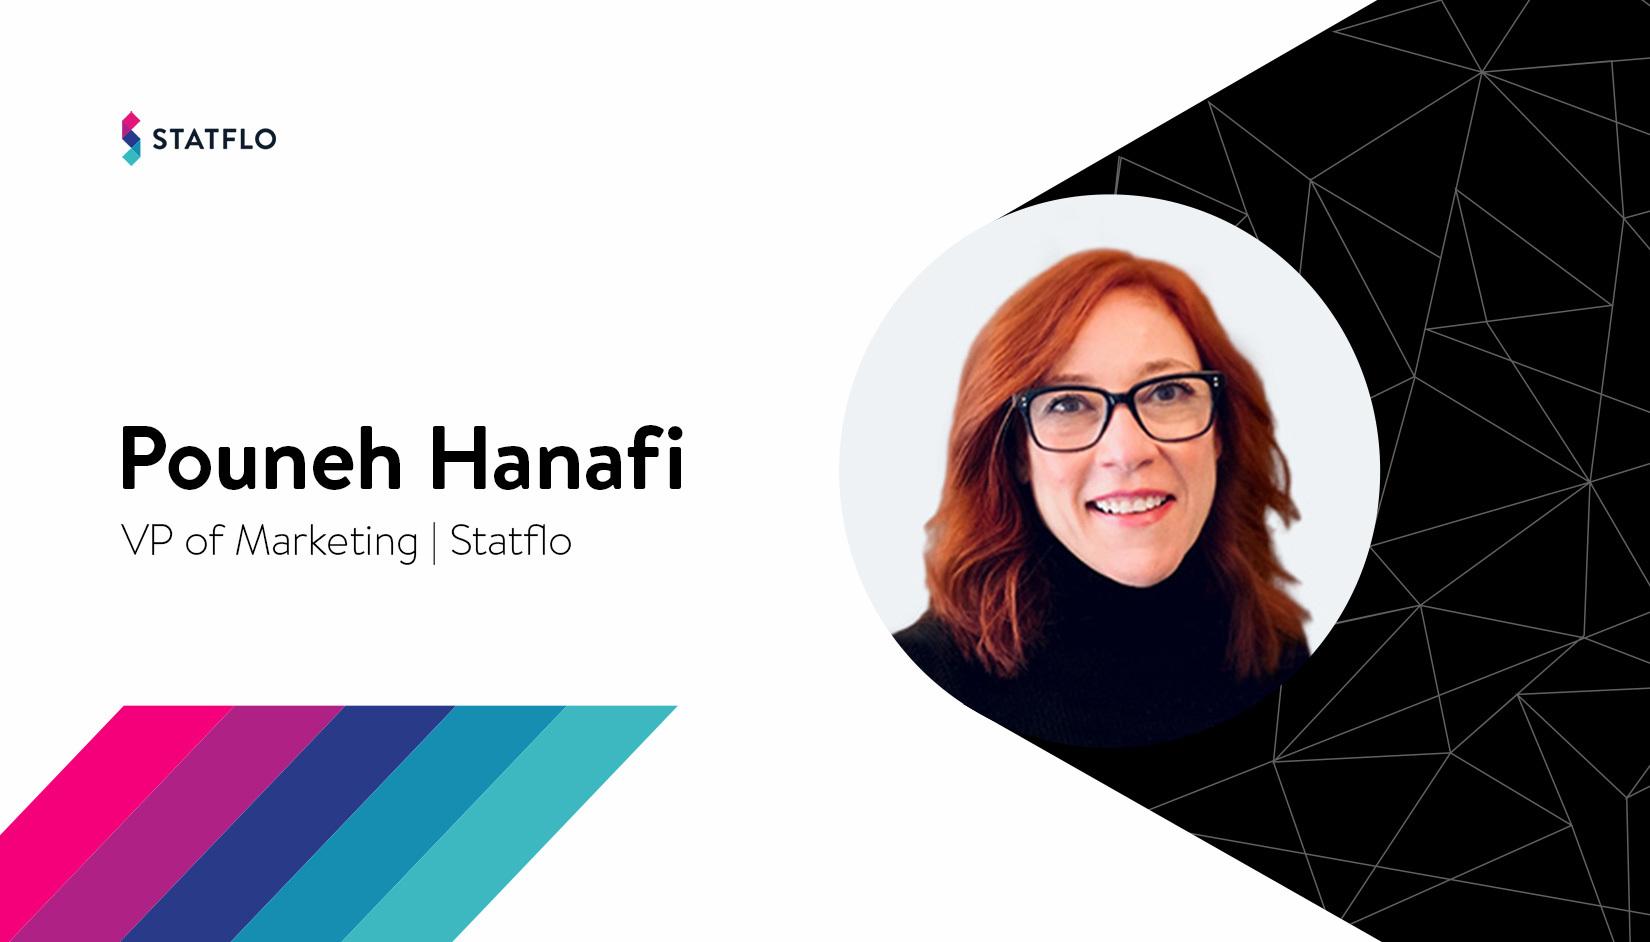 Pouneh Hanafi joins Statflo as VP of Marketing